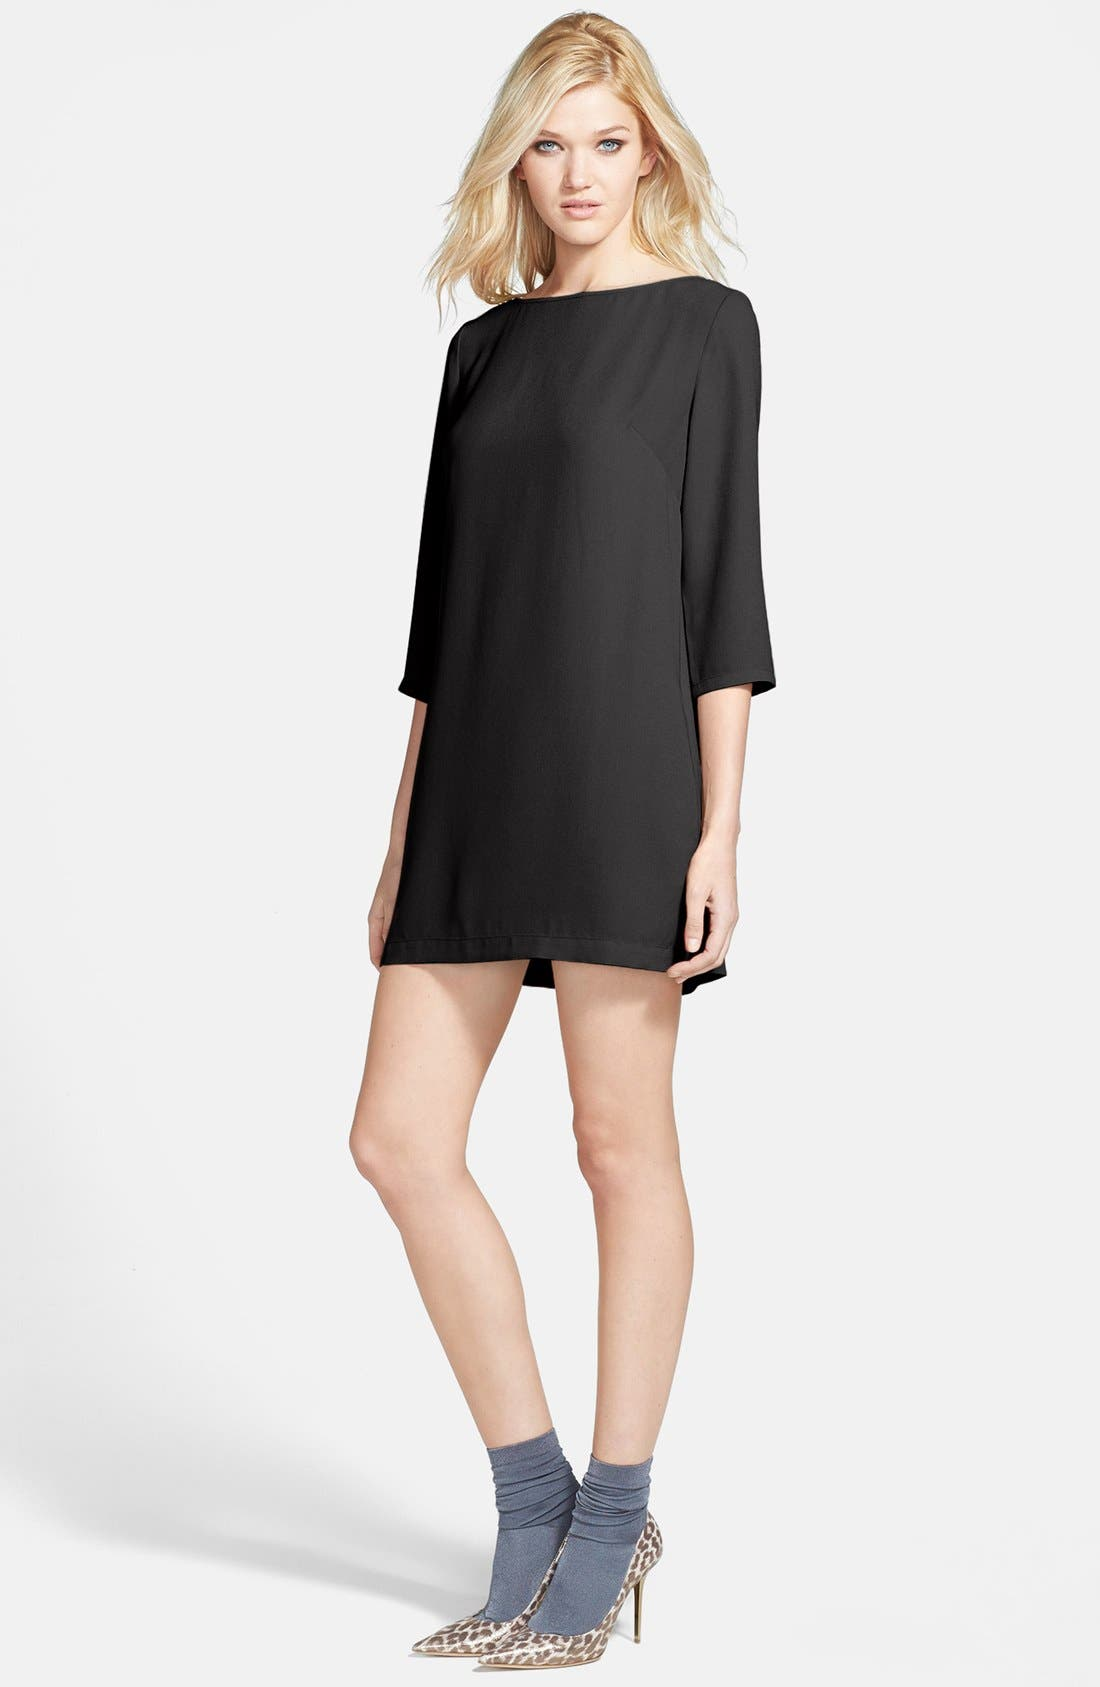 LEITH Boatneck Crepe Shift Dress, Main, color, 001